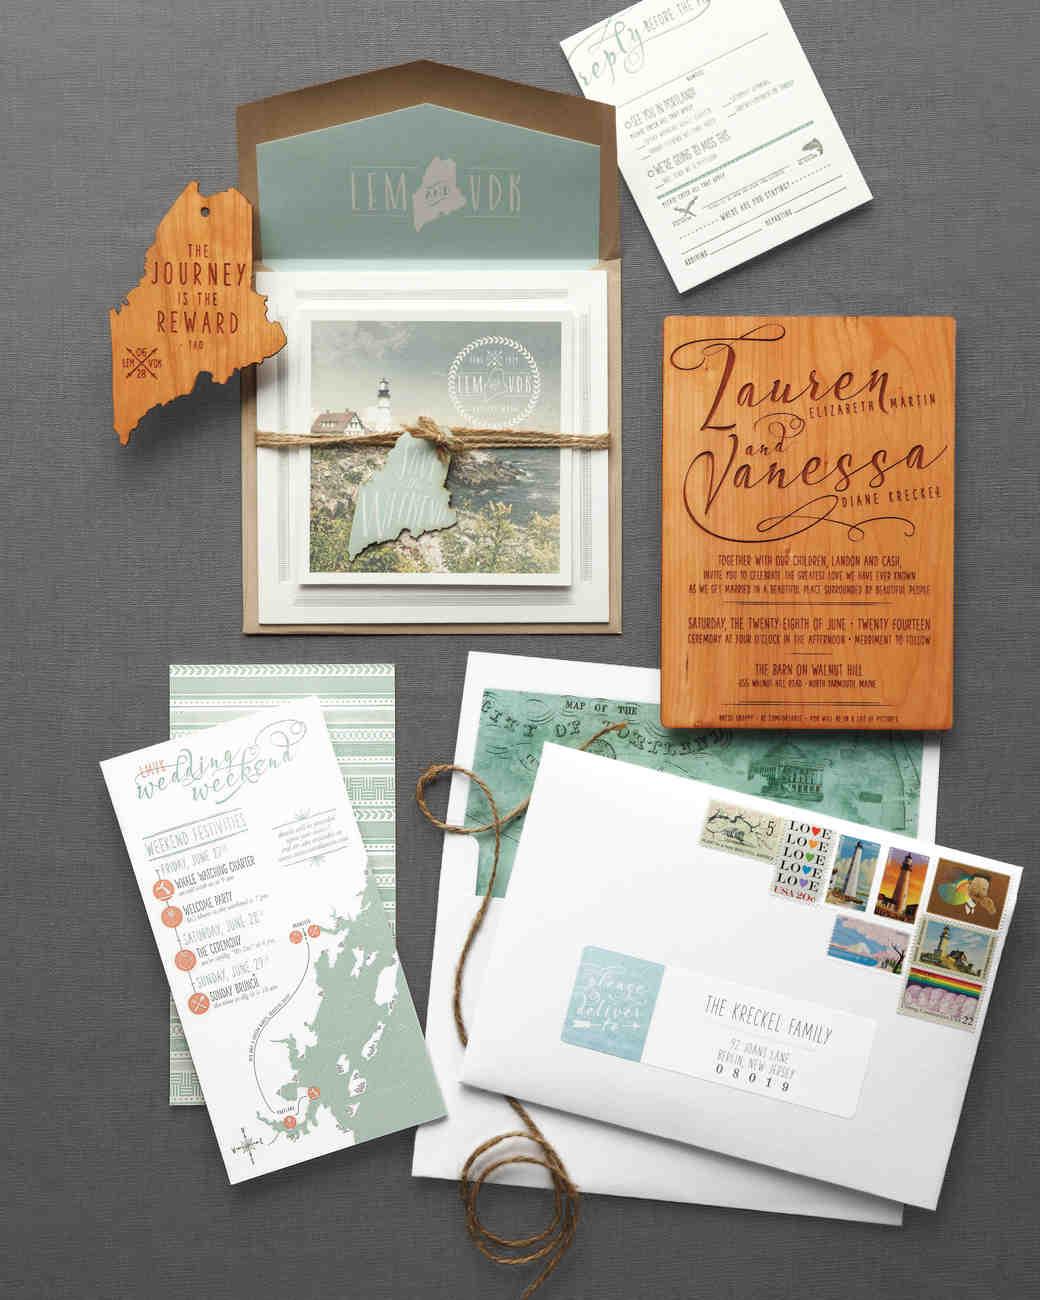 Manly Yunhee Kim Elevated Ideas Your Rustic Wedding Invitations Martha Wedding Invitation Suites Packages Wedding Invitation Suite Free Template wedding Wedding Invitation Suite